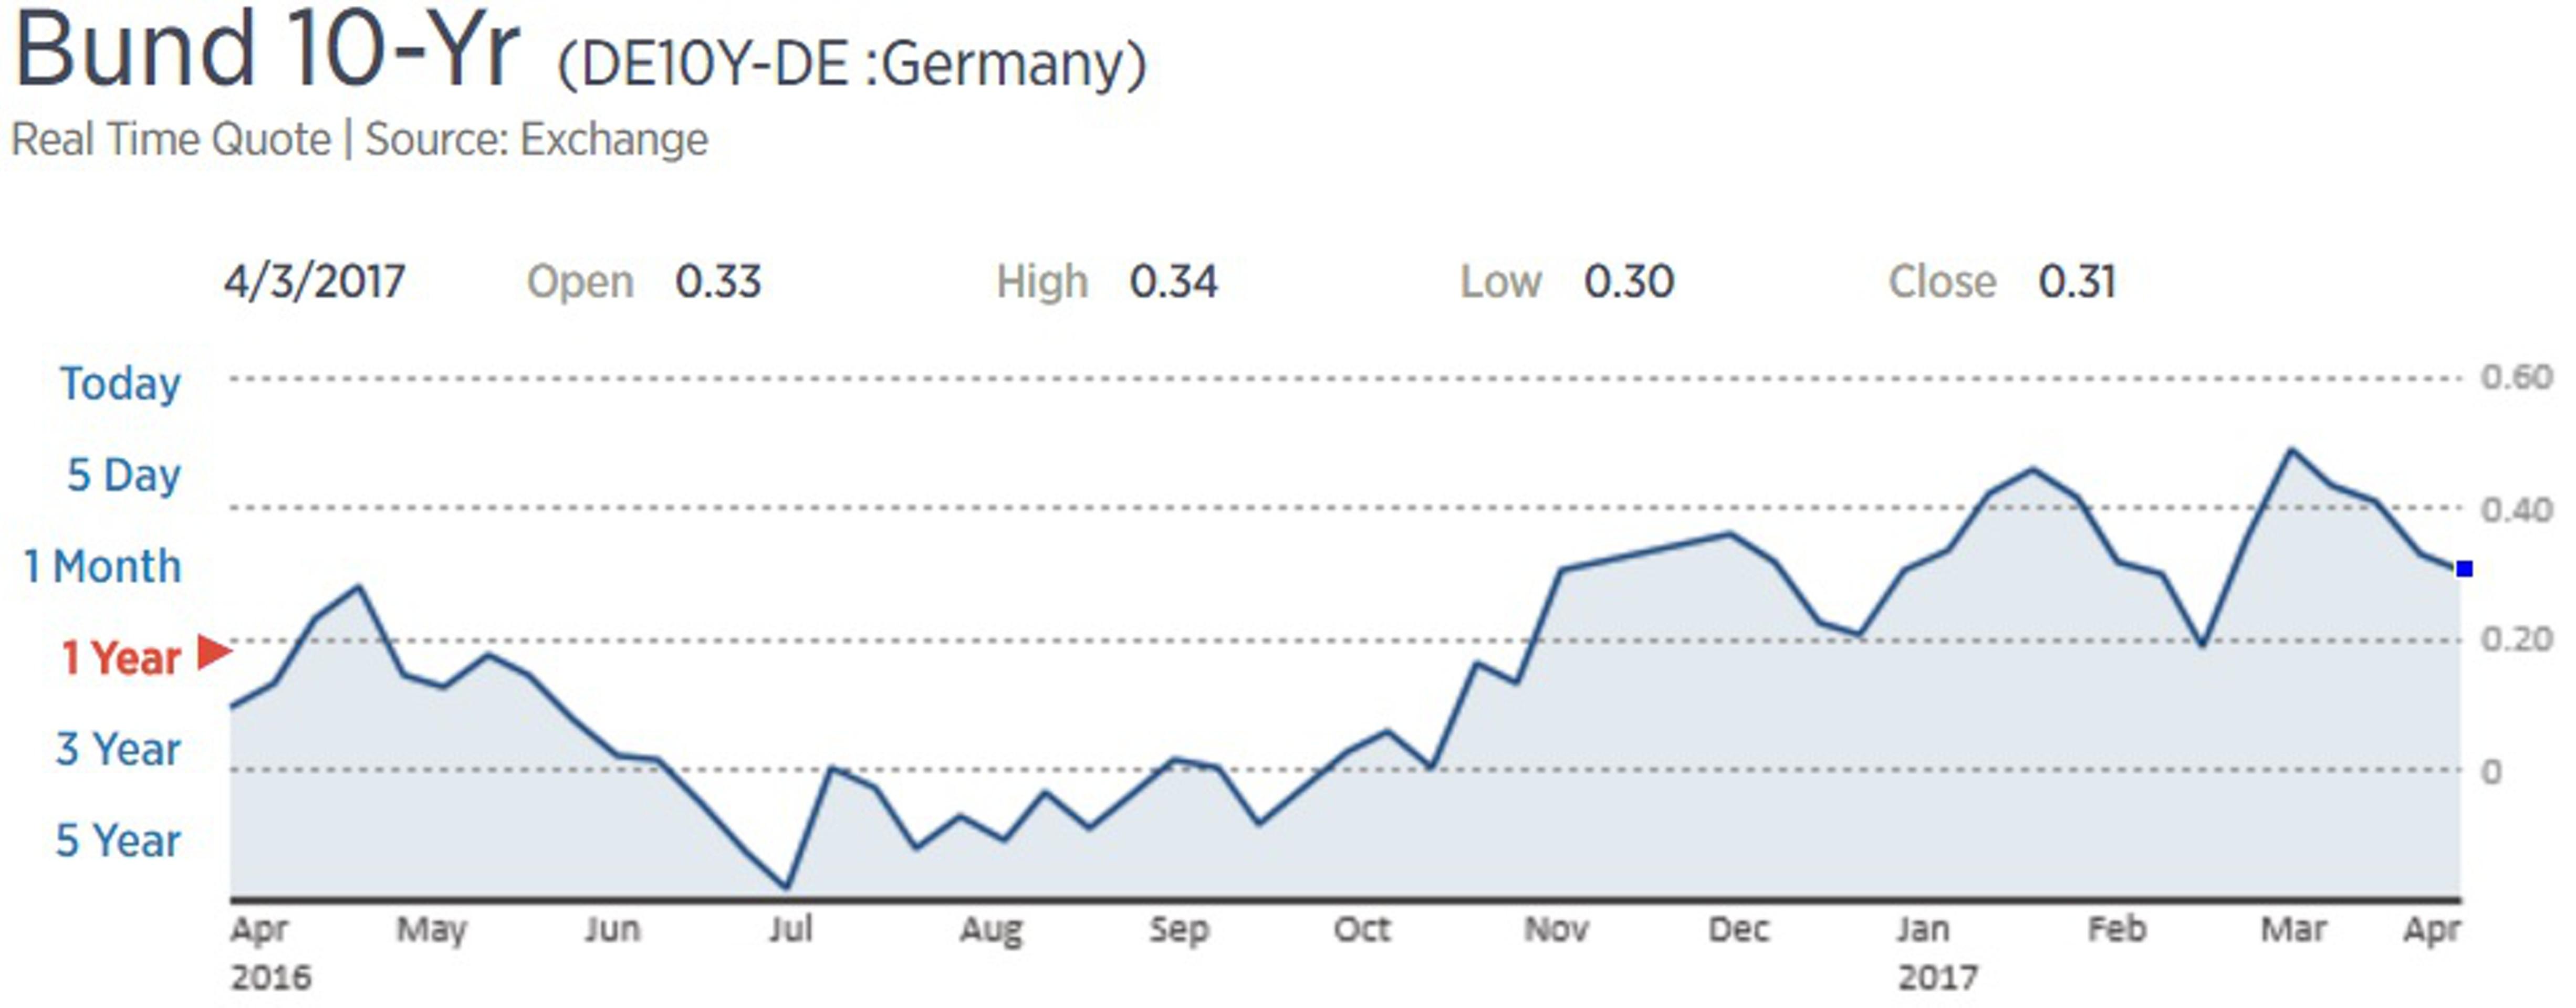 Кёре: стимулы ЕЦБ не угрожают финансовым рынкам